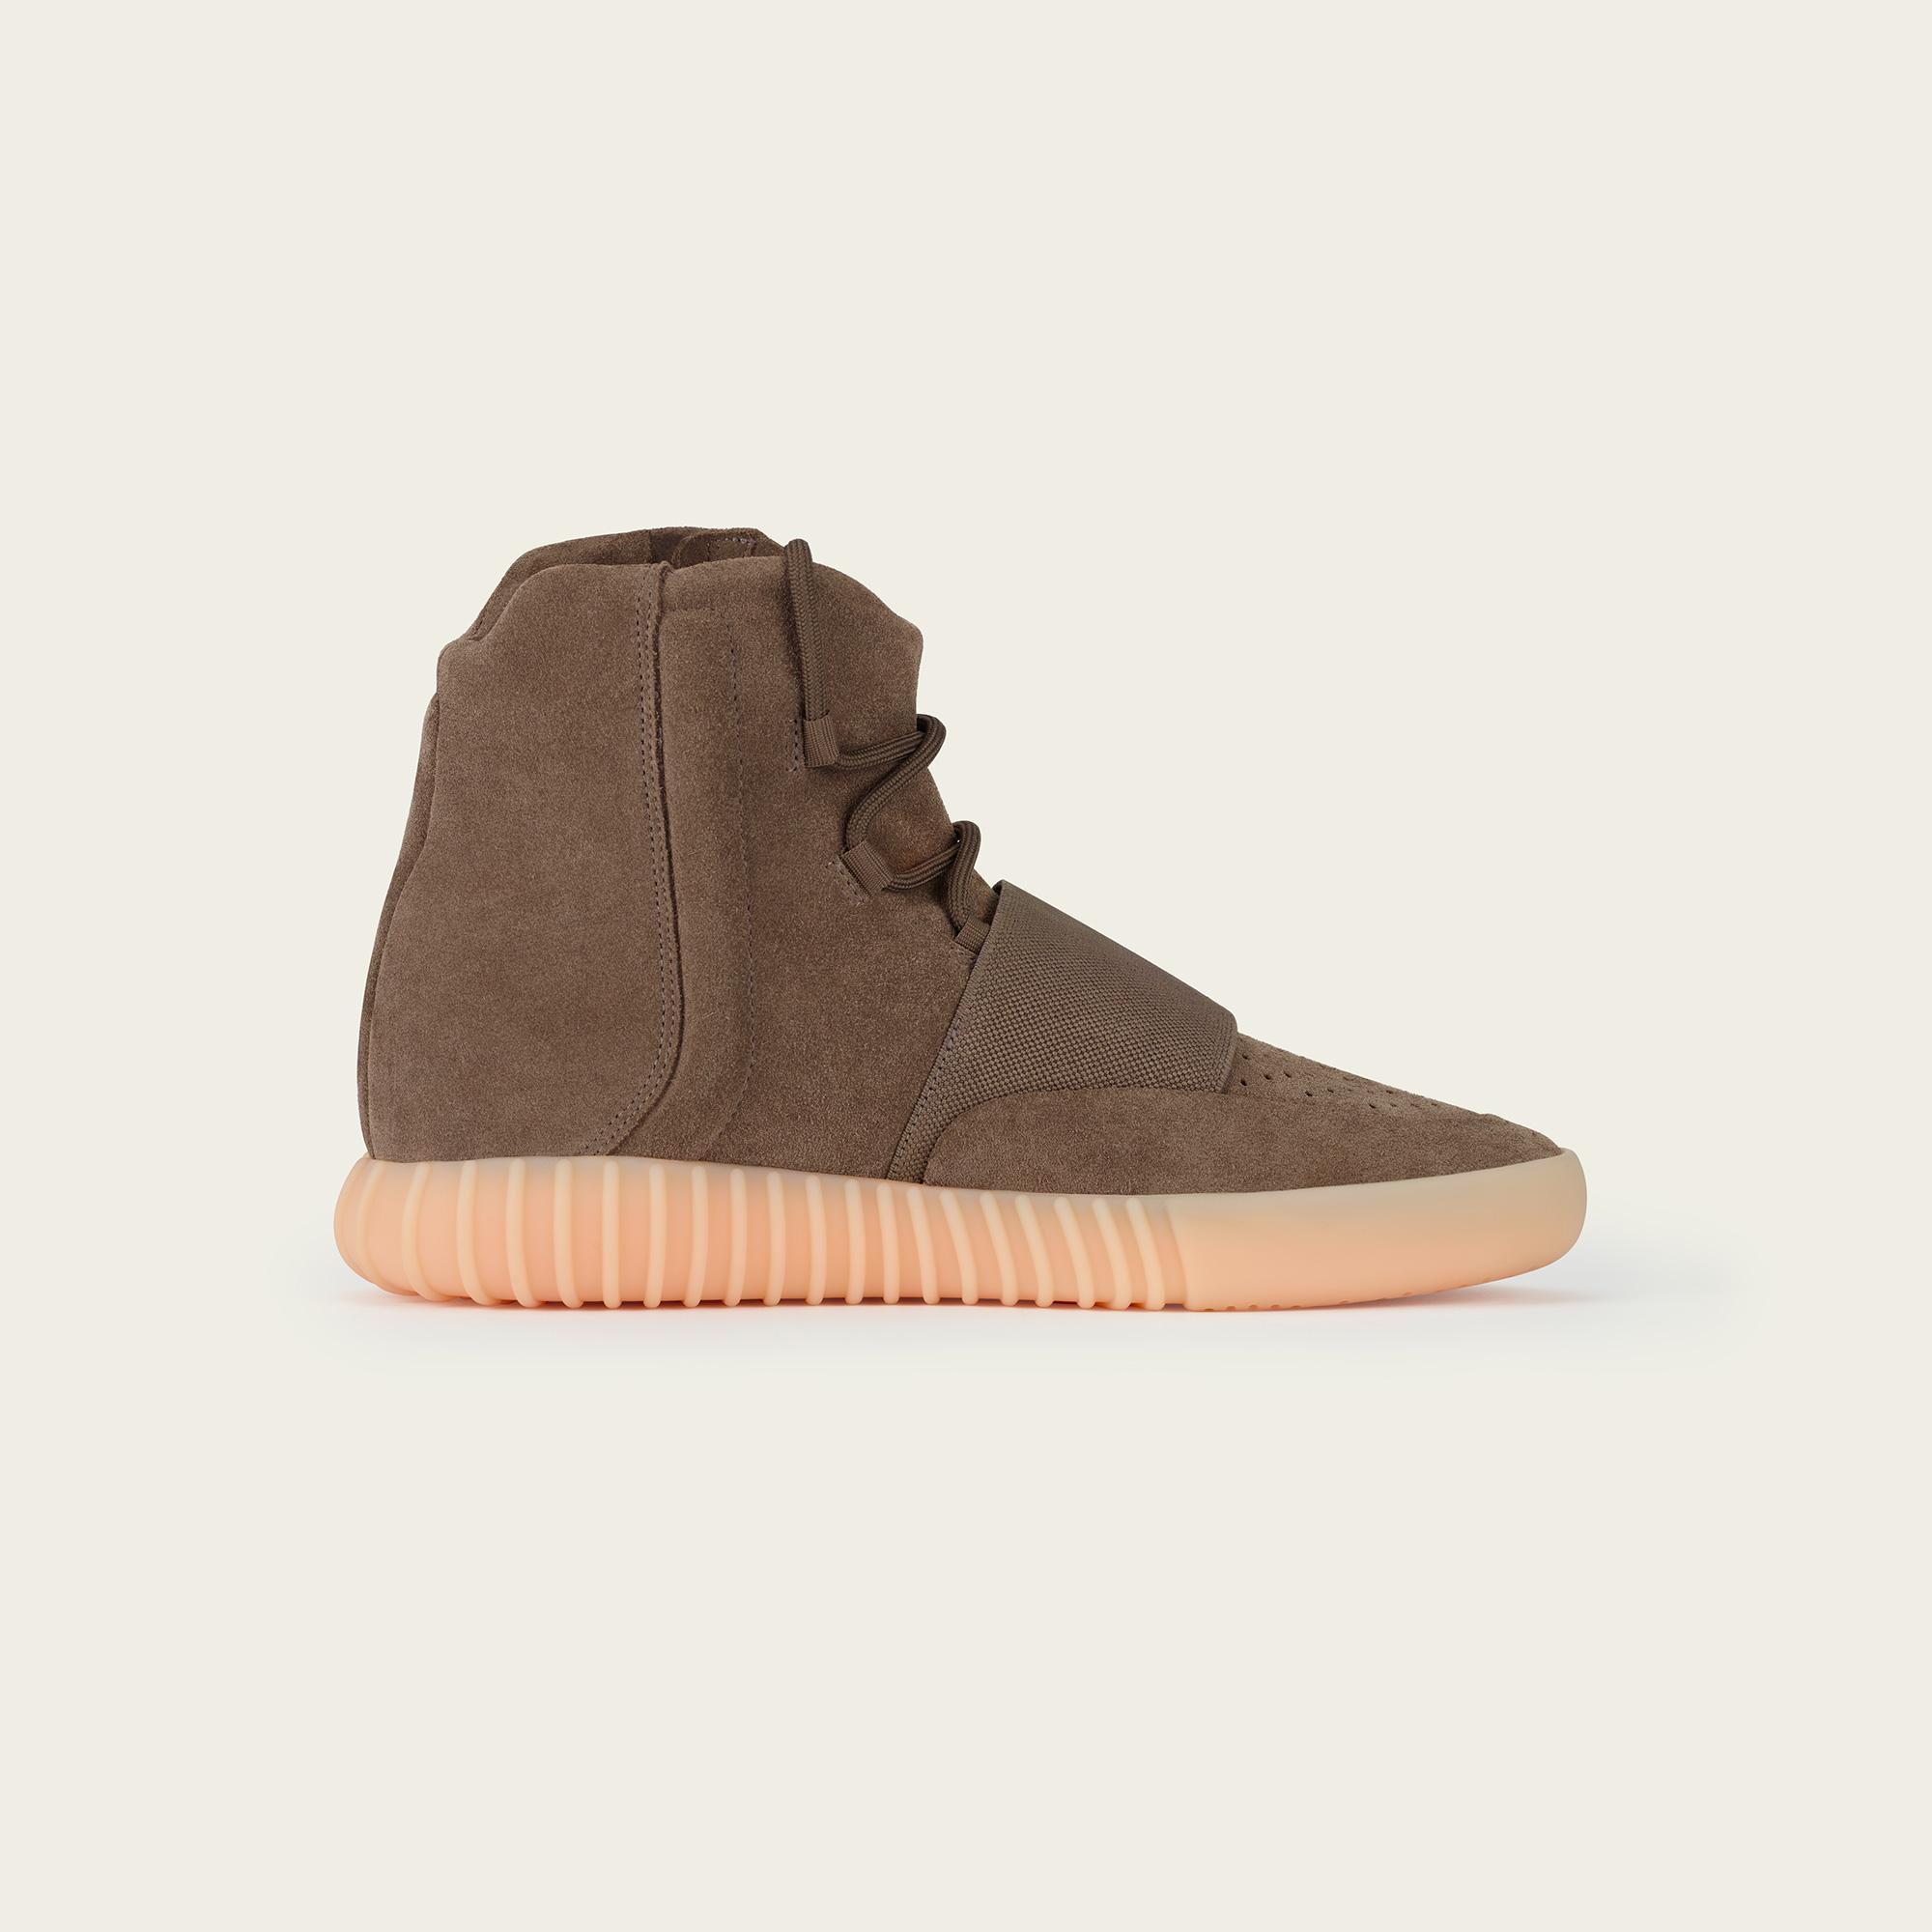 505560b4b14e4 adidas-yeezy-boost-750-brown-3 - WearTesters